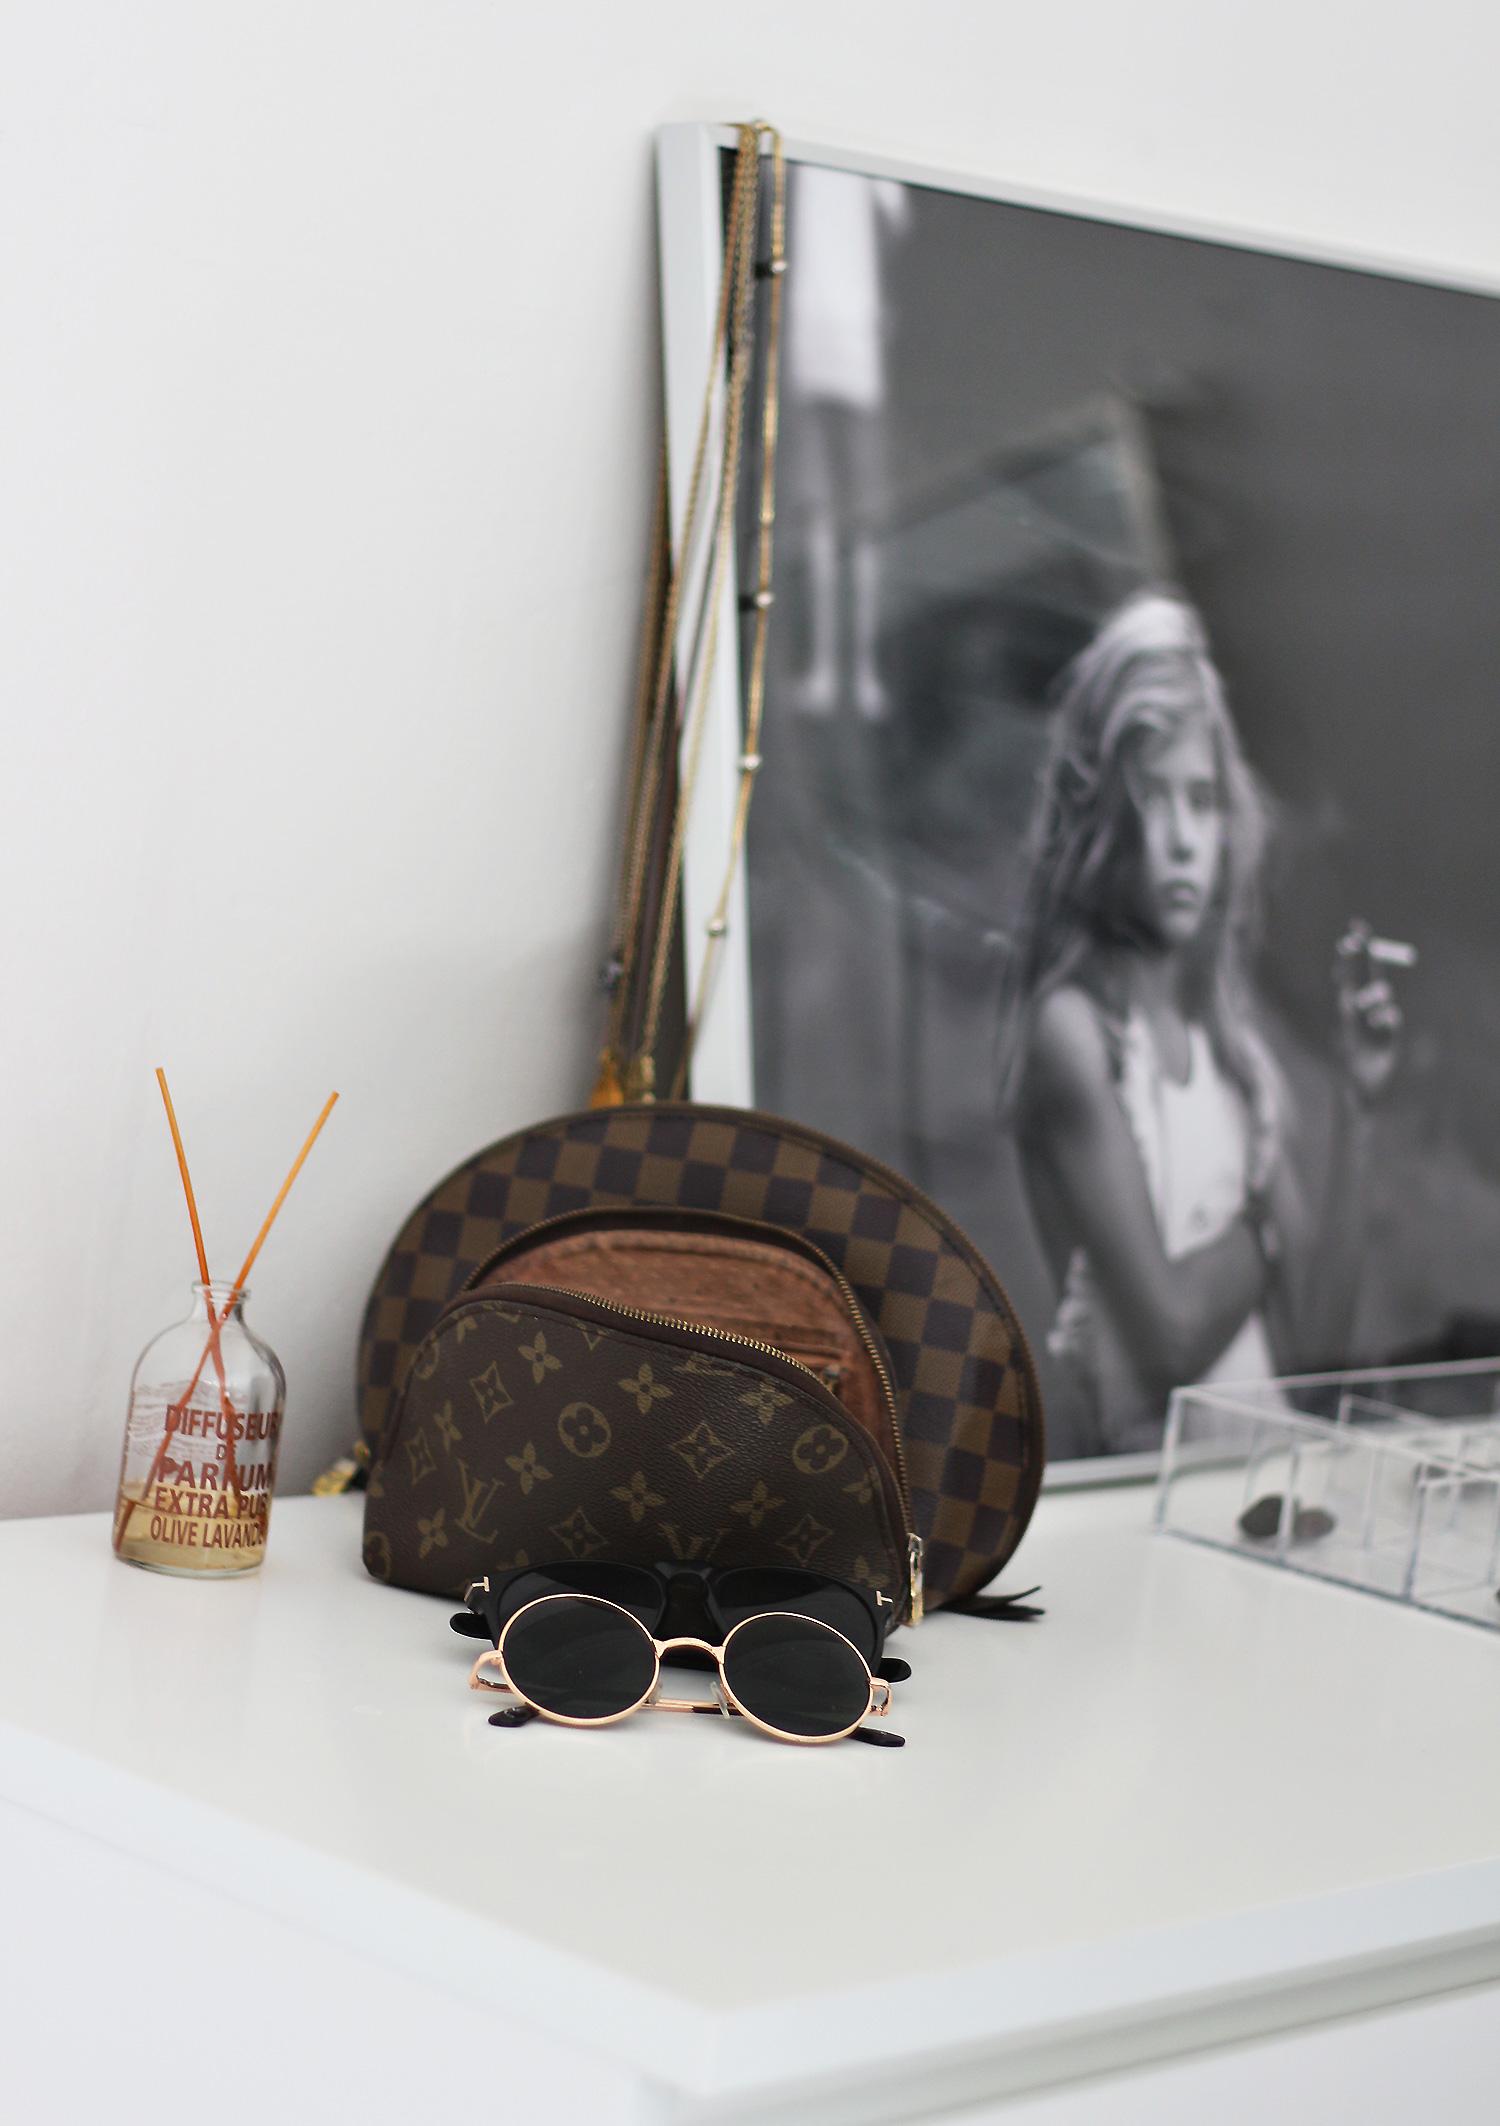 Louis-Vuitton-pung@2x